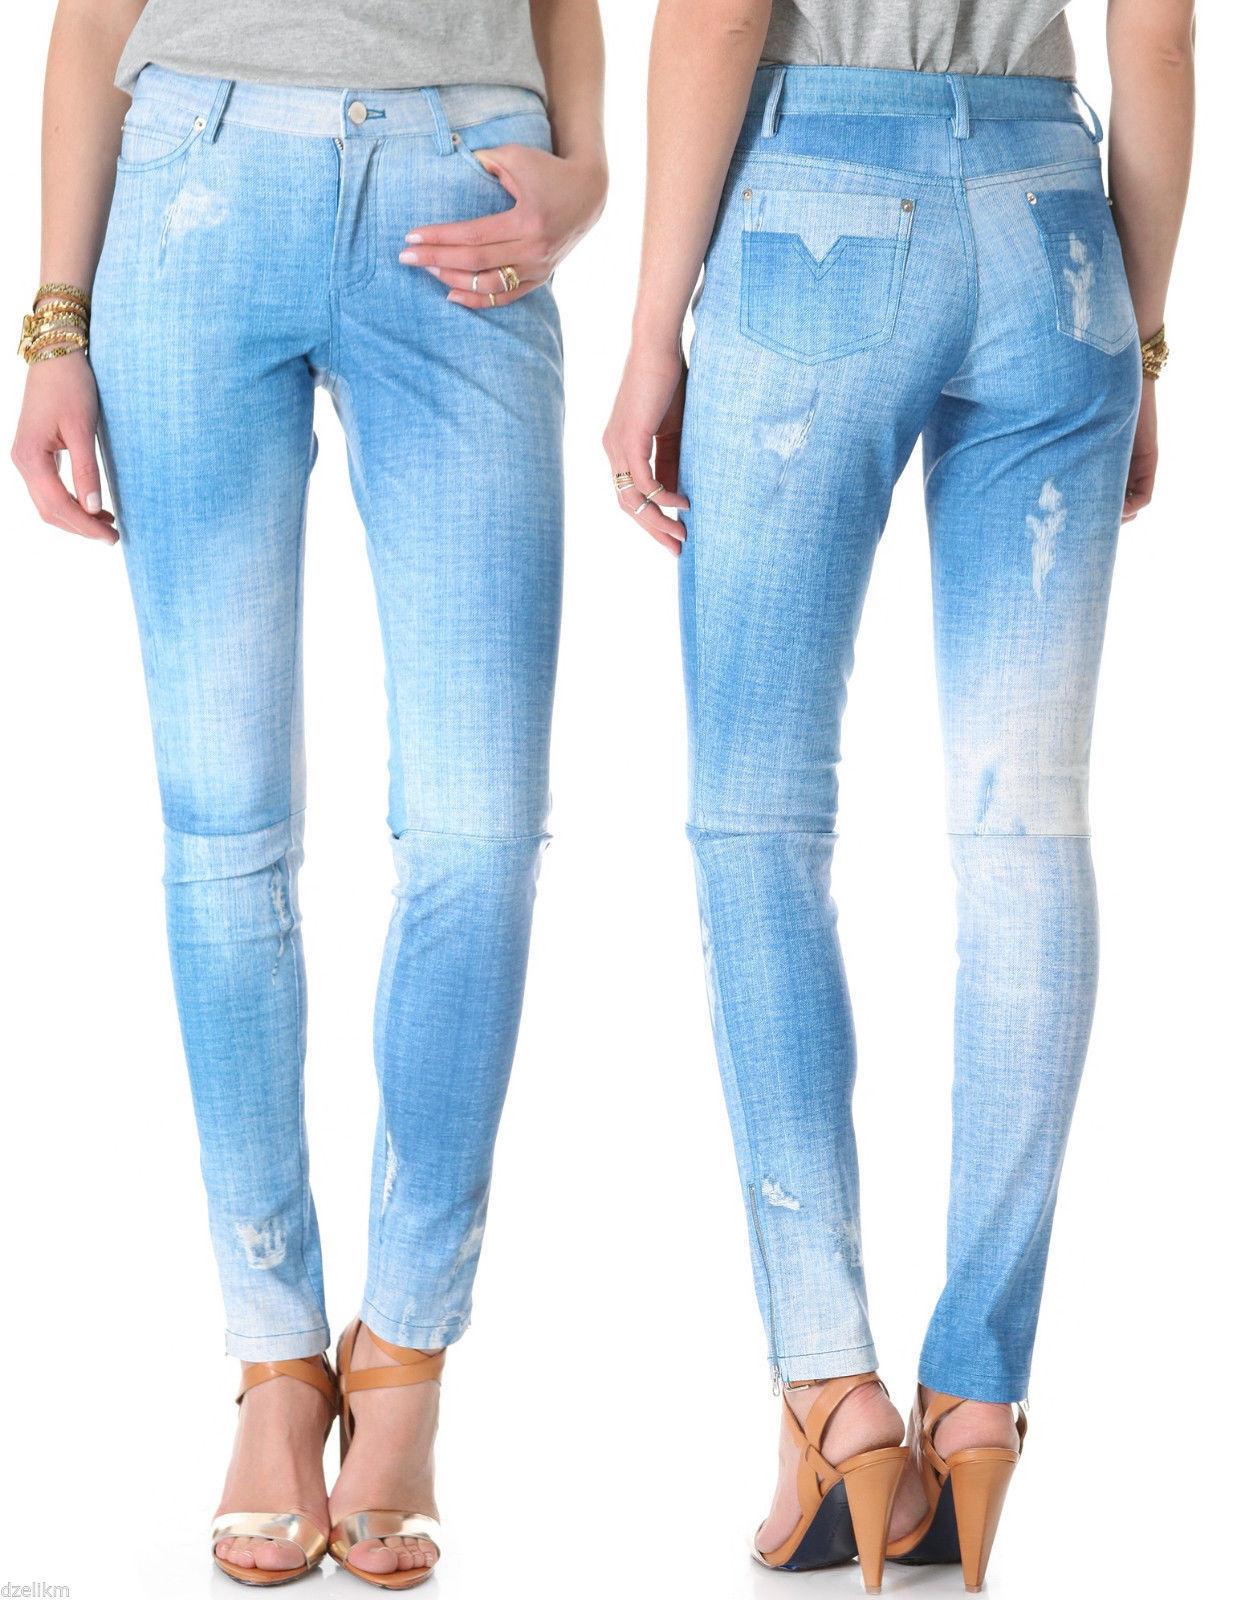 NEW  998 Rebecca Minkoff Blau Collette Denim Indigo Print Leather Skinny Pants 0